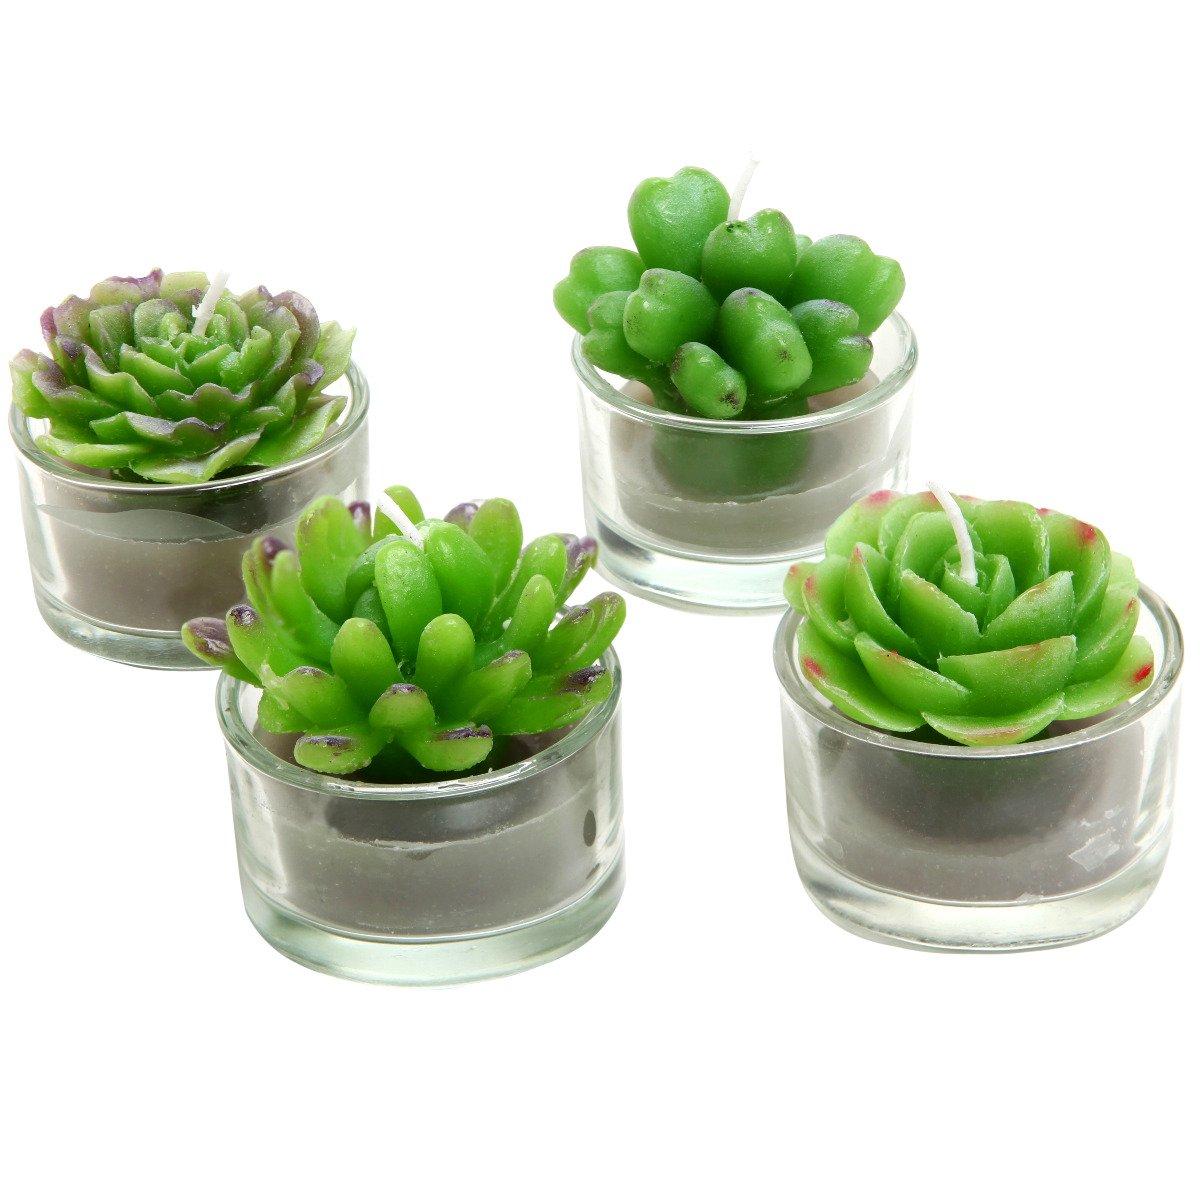 Amazon.com: Assortment Of 4 Mini Green Desert Succulent Plants Shaped  Candles / Tea Lights Table / Mantle Decorations: Home U0026 Kitchen